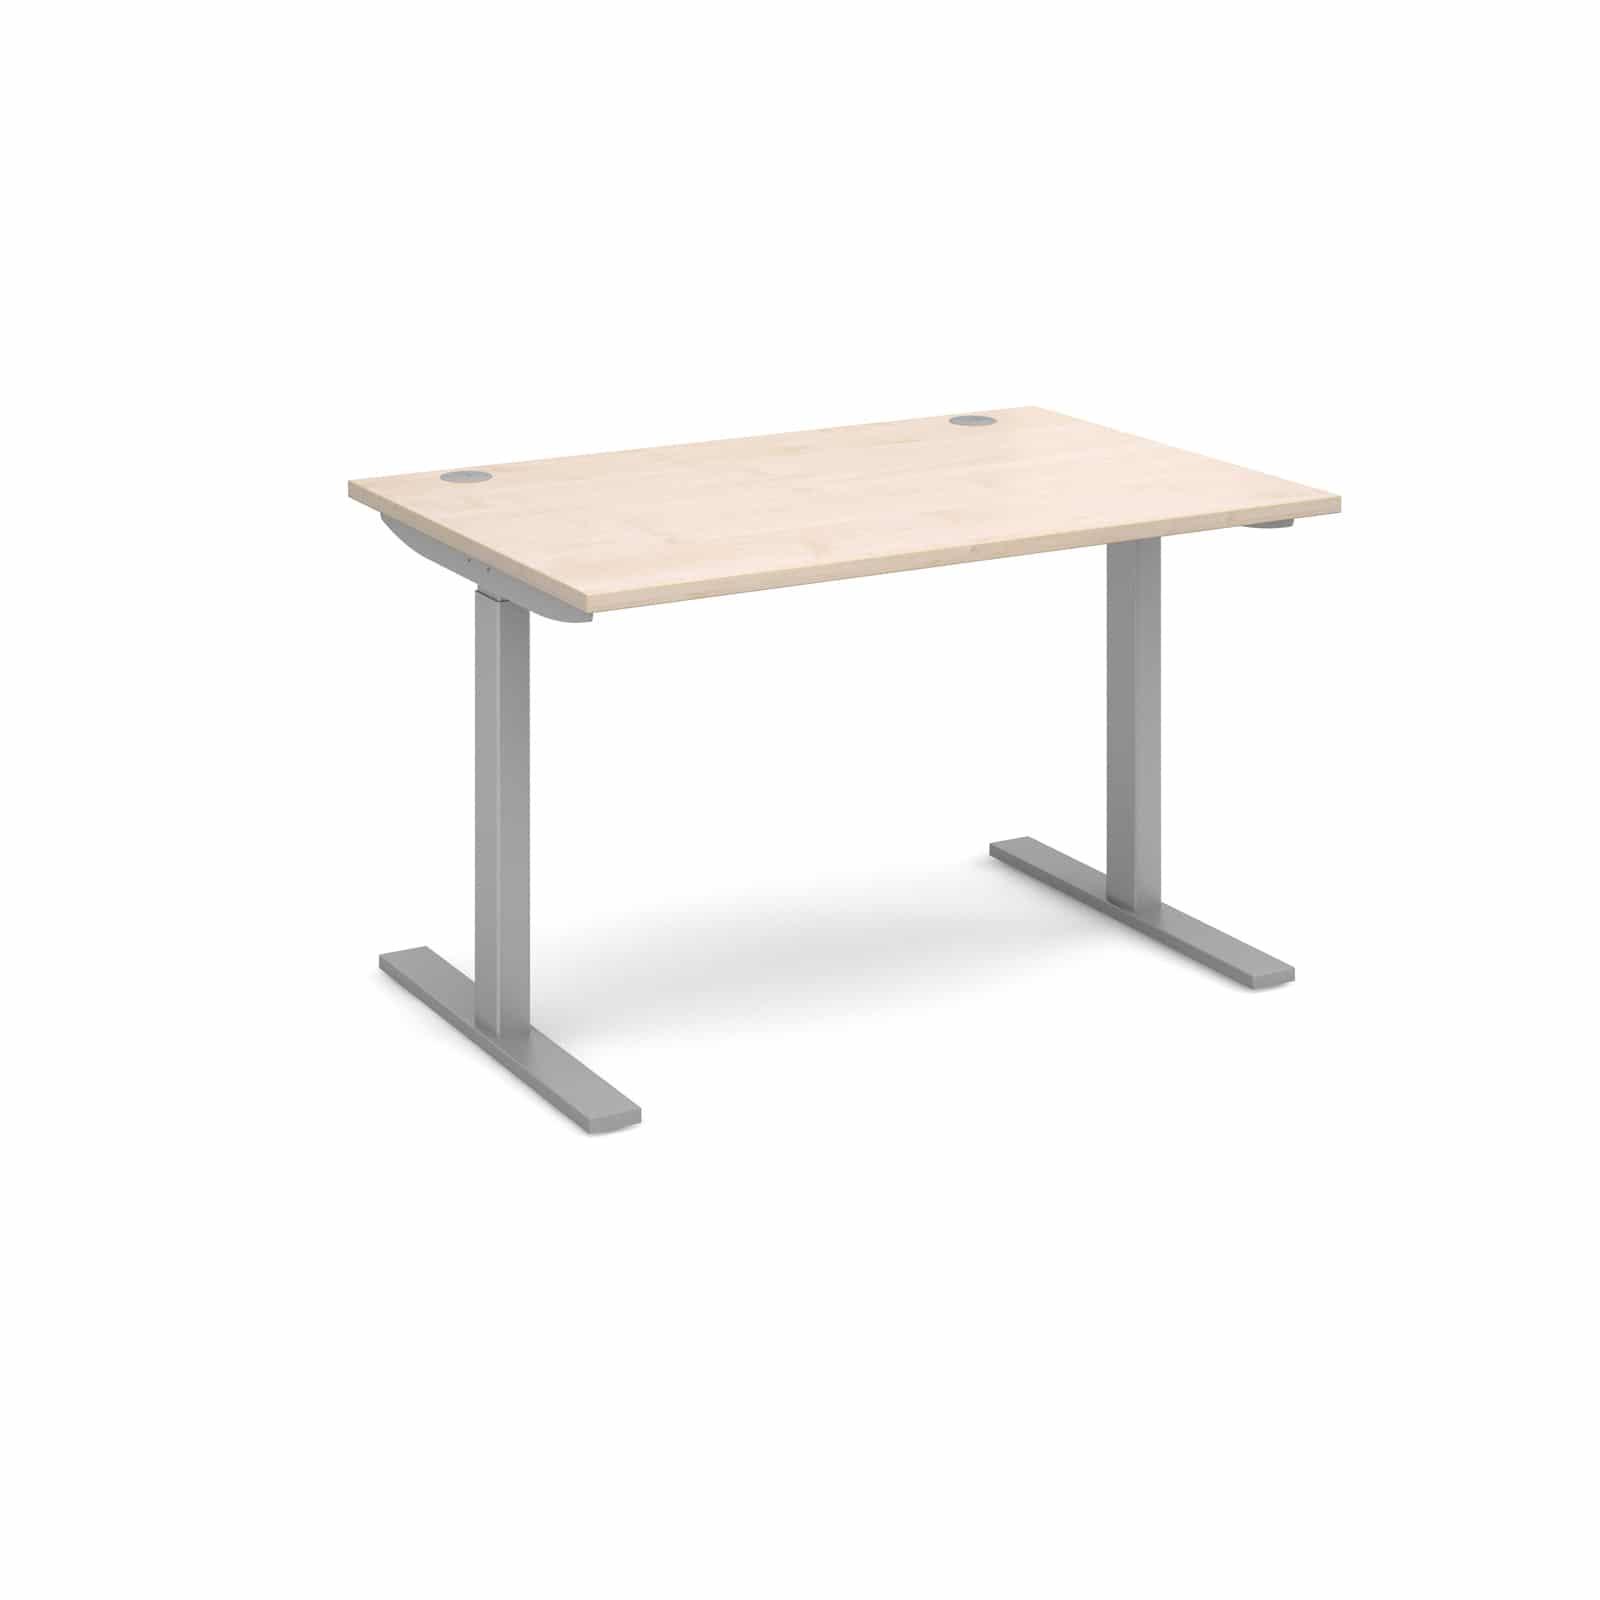 elev8 1200 x 800 sit stand desk silver frame maple bimi office